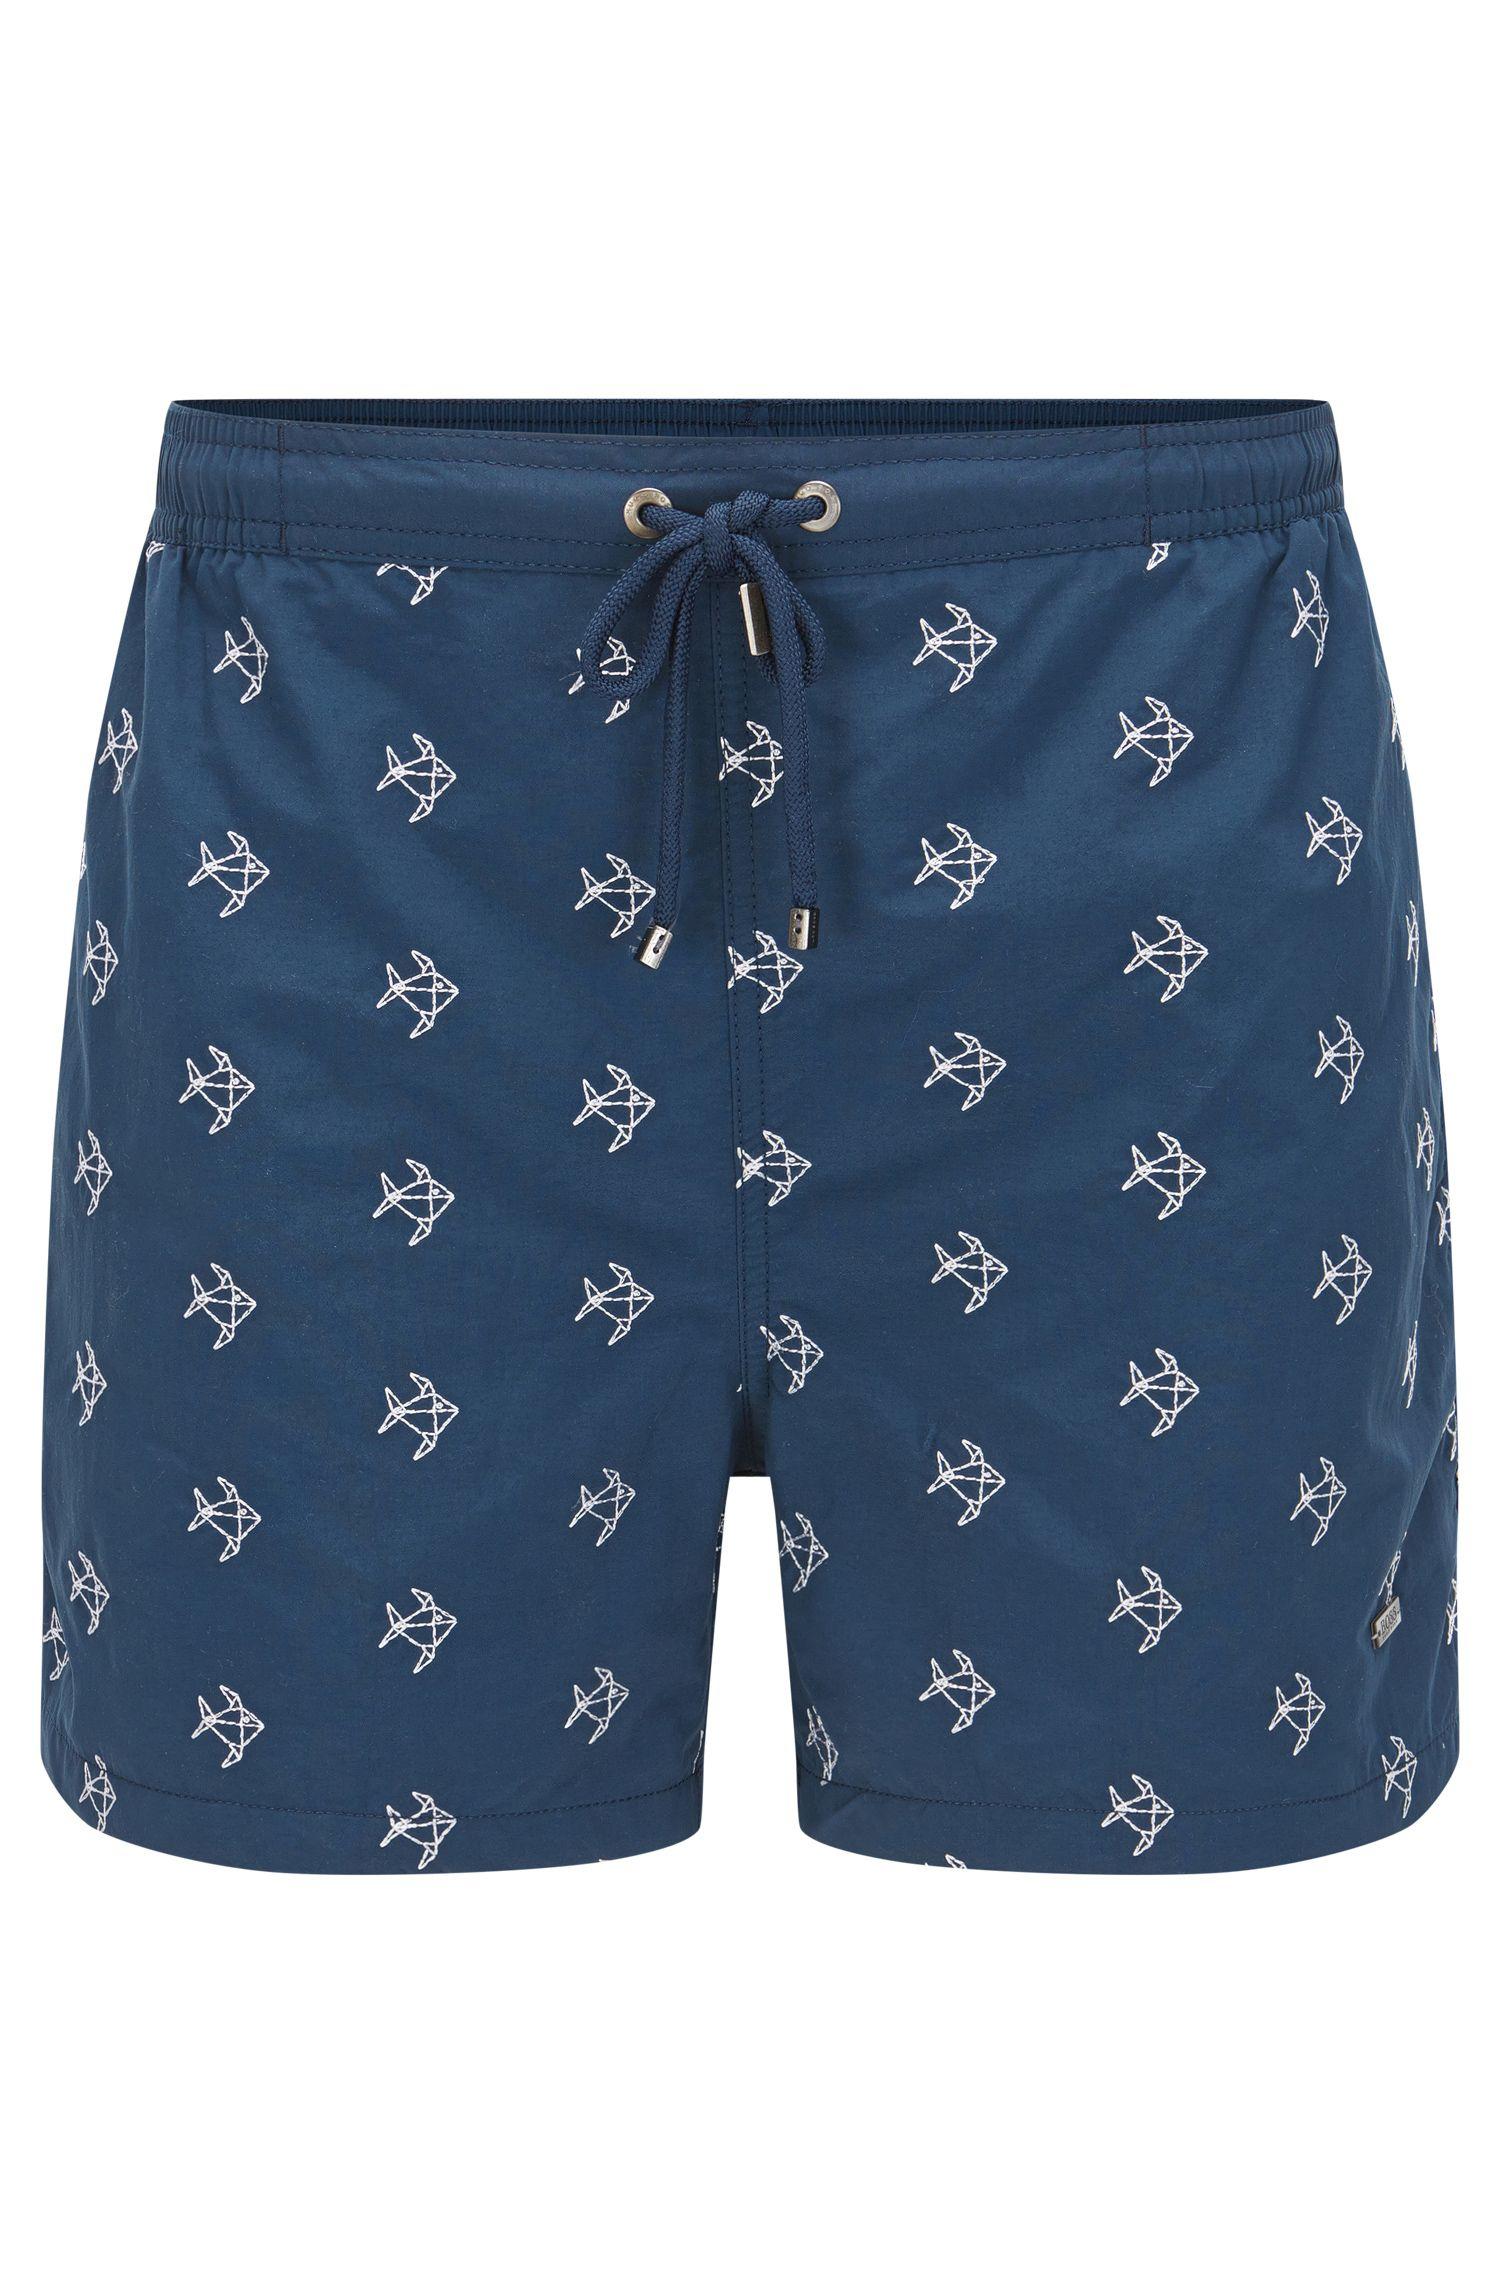 Quick Dry Nylon Embroidered Swim Short | White Shark, Dark Blue